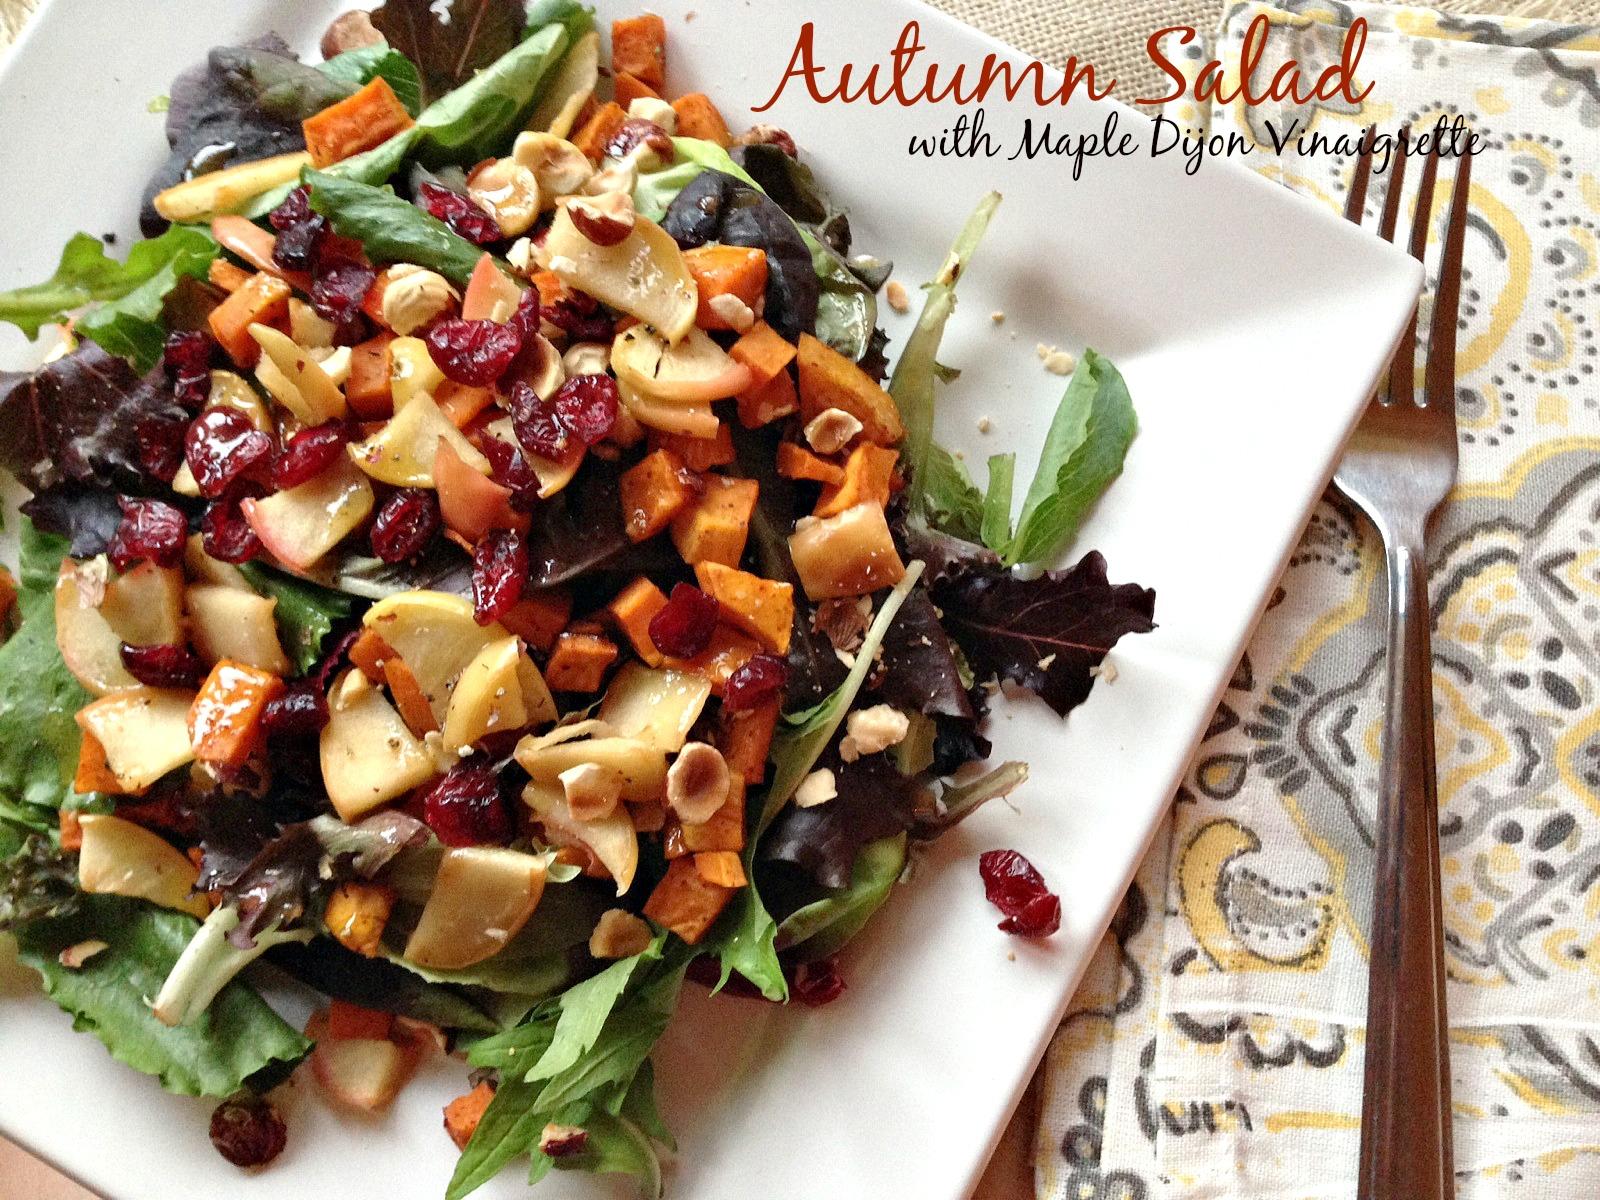 Autumn Salad with Maple Dijon Vinaigrette